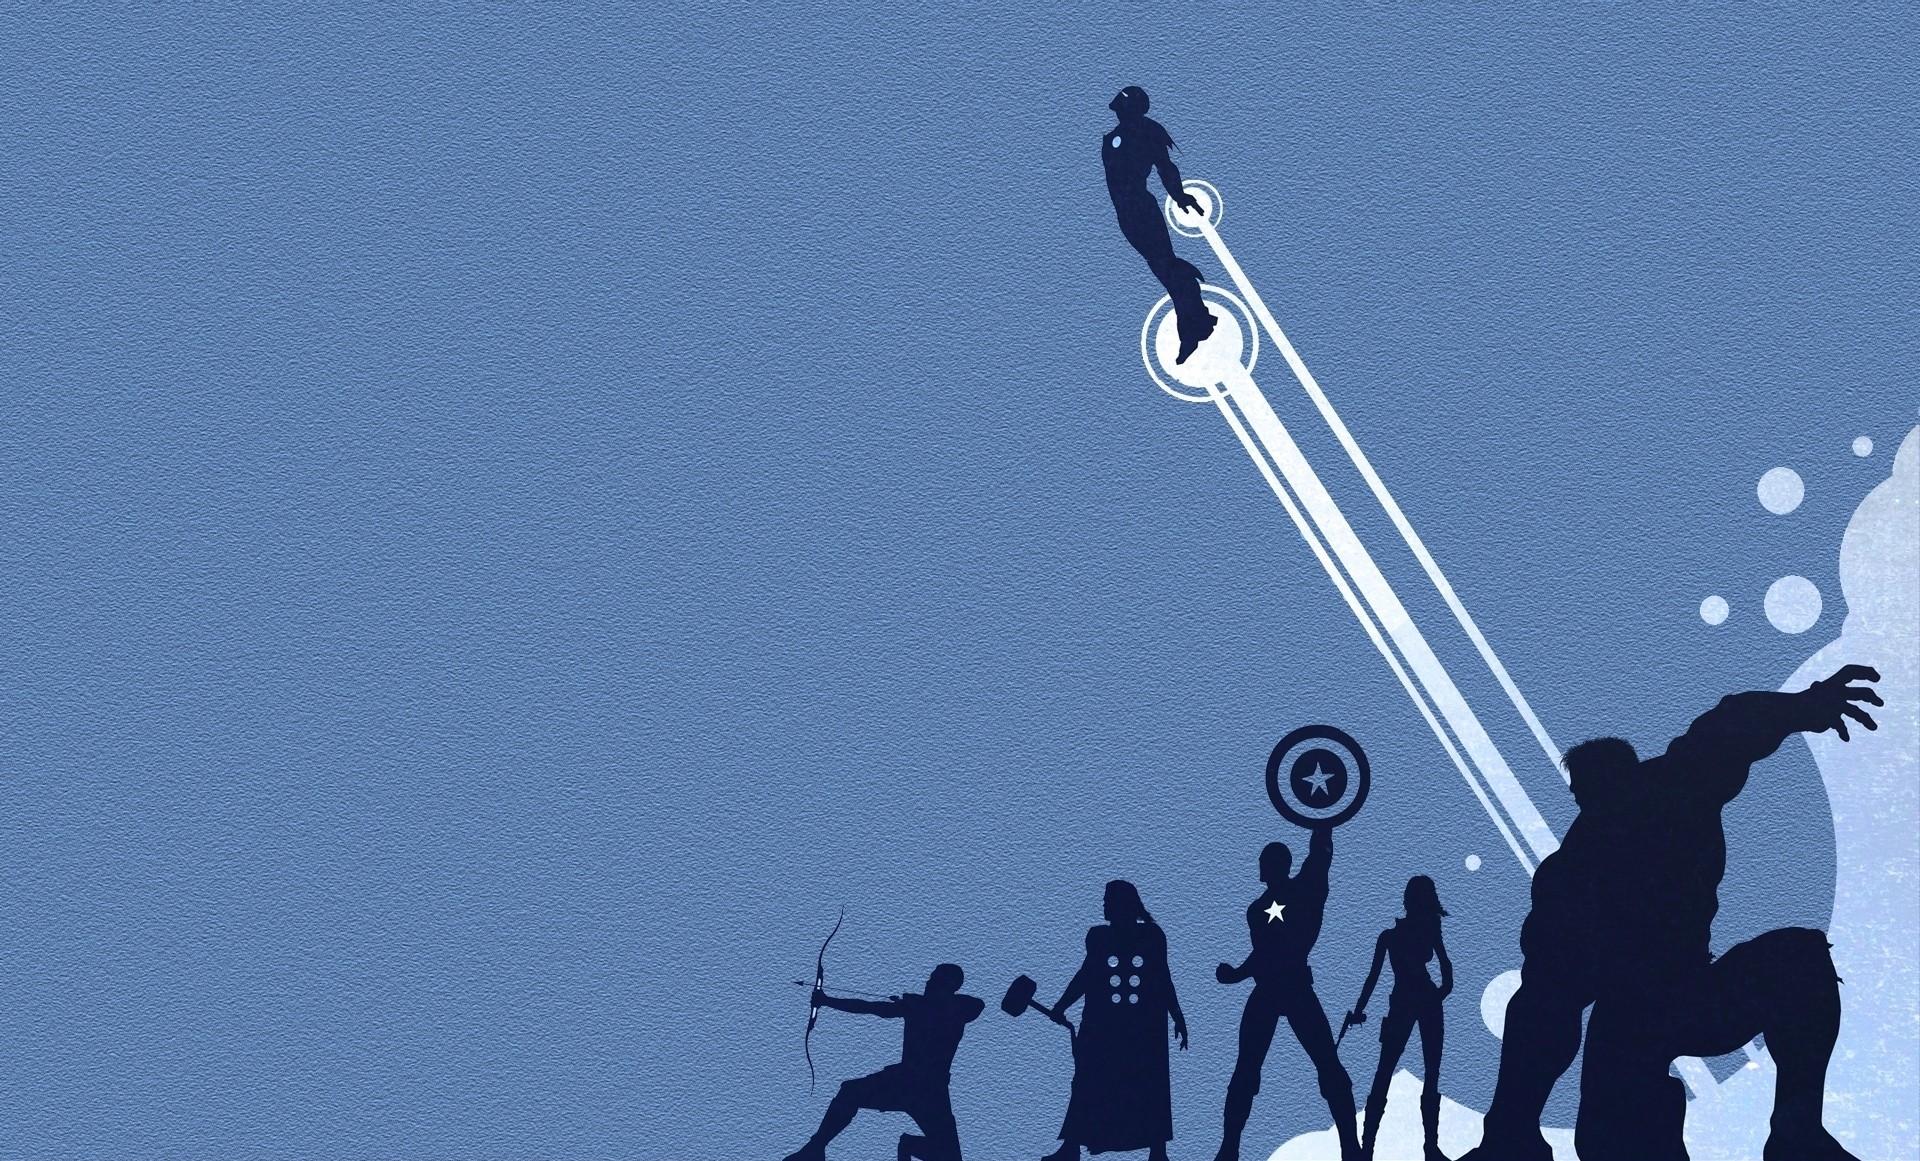 General 1920x1161 Iron Man Marvel Comics Hulk Thor Captain America Black Widow Hawkeye The Avengers artwork